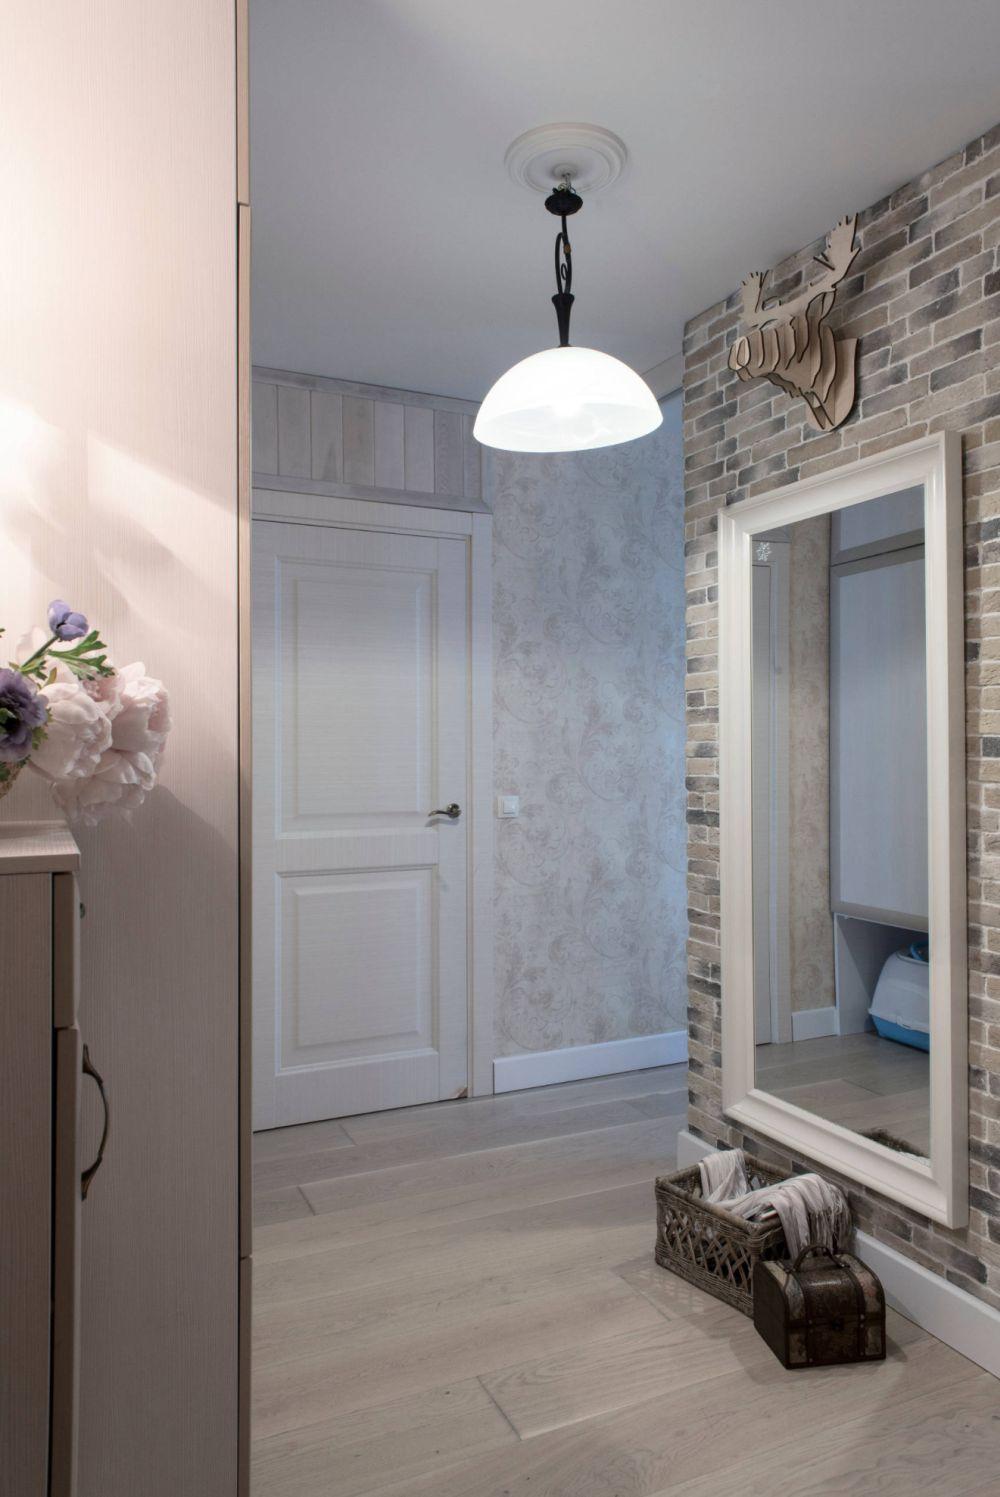 adelaparvu.com despre apartament 48 mp, stil provensal, Designer Svetlana Krasnova, Foto Natalia Kupriyanova (14)